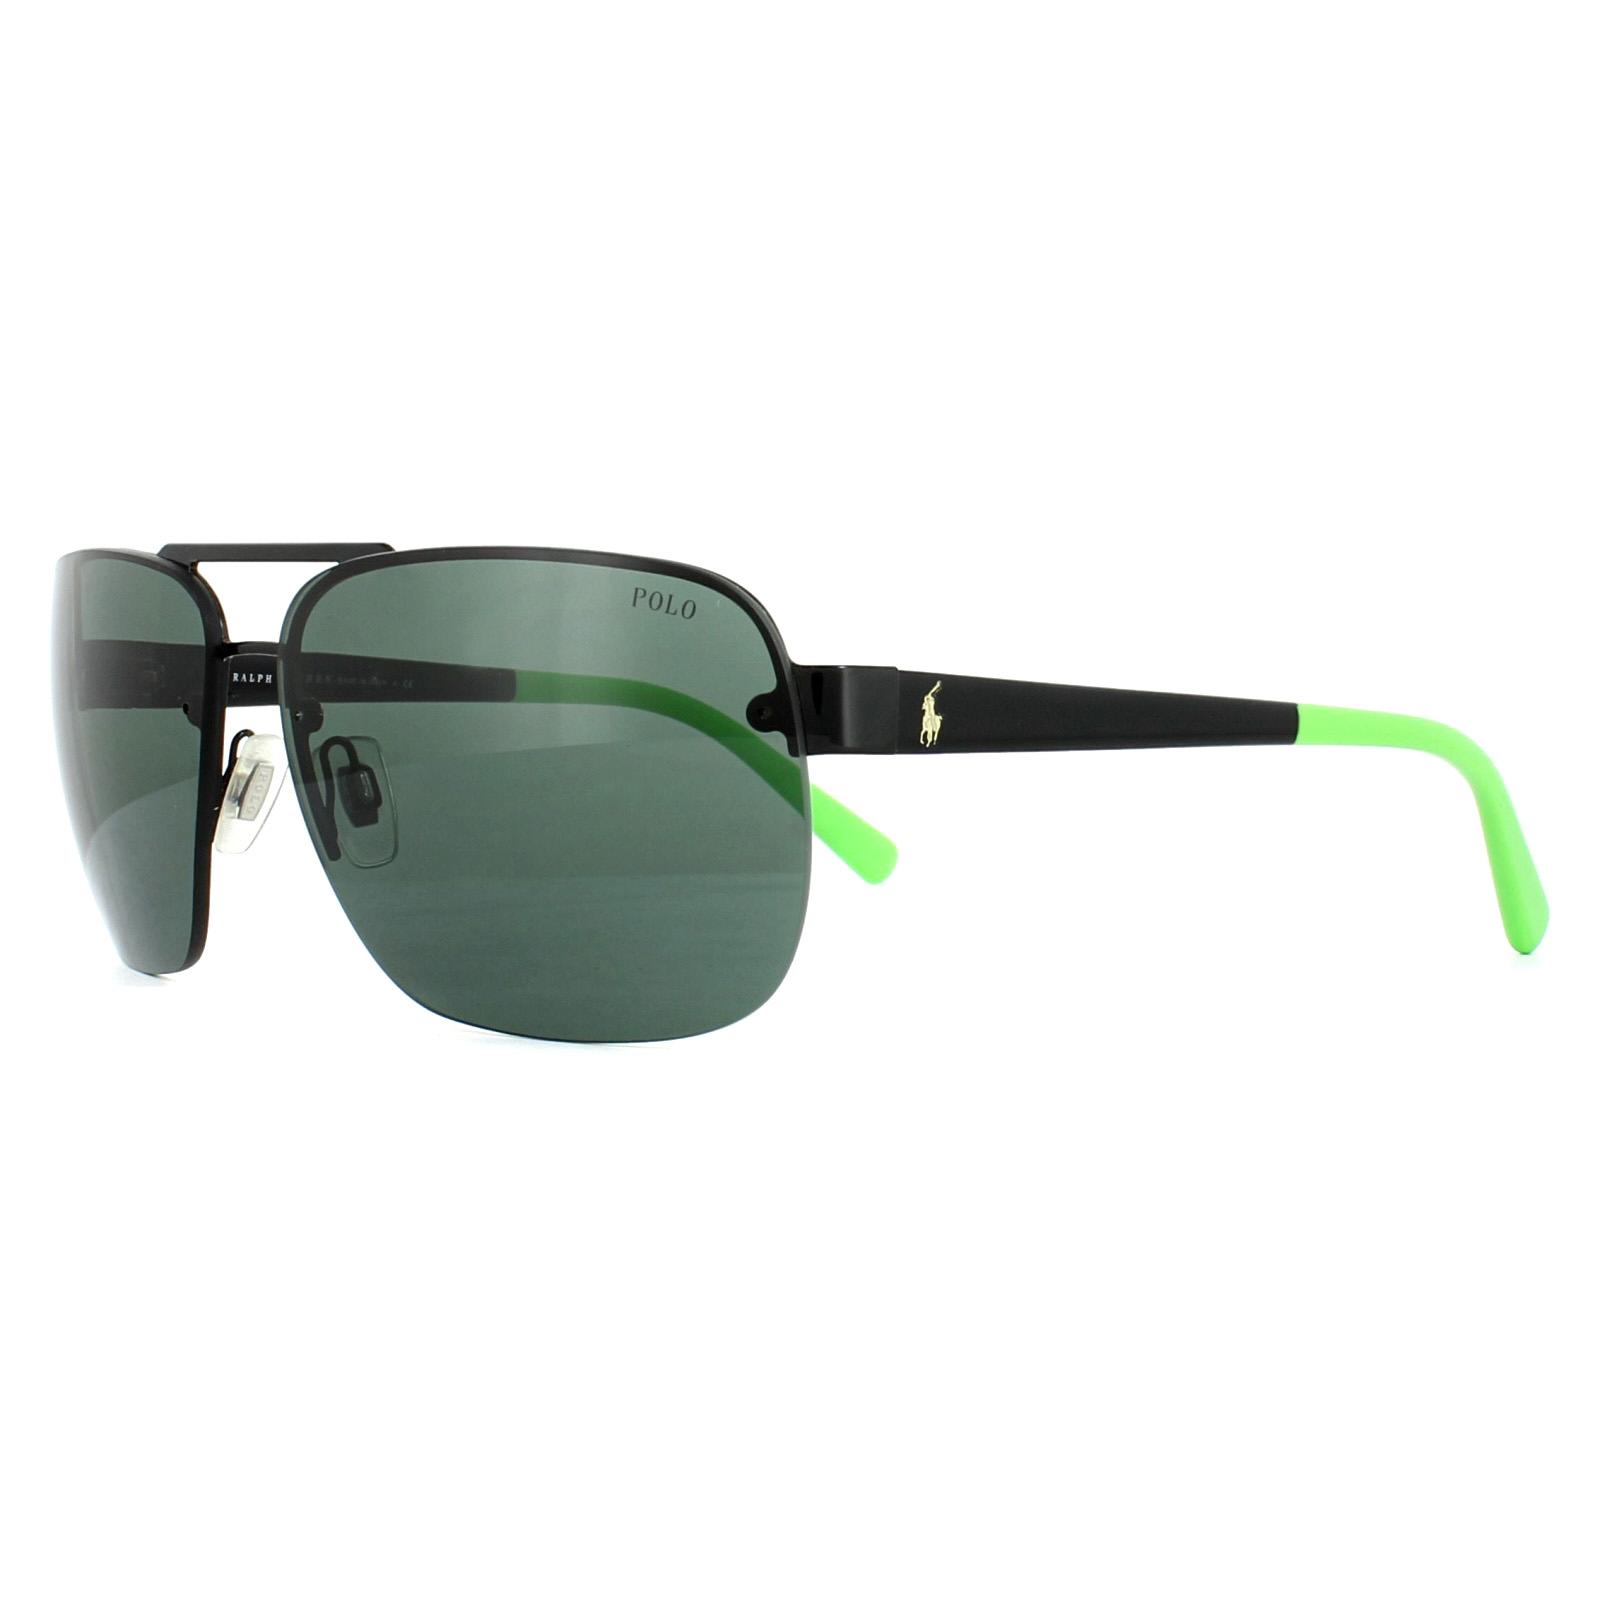 1a58c12c9a6e Sentinel Polo Ralph Lauren Sunglasses 3071 900371 Shiny Black Green